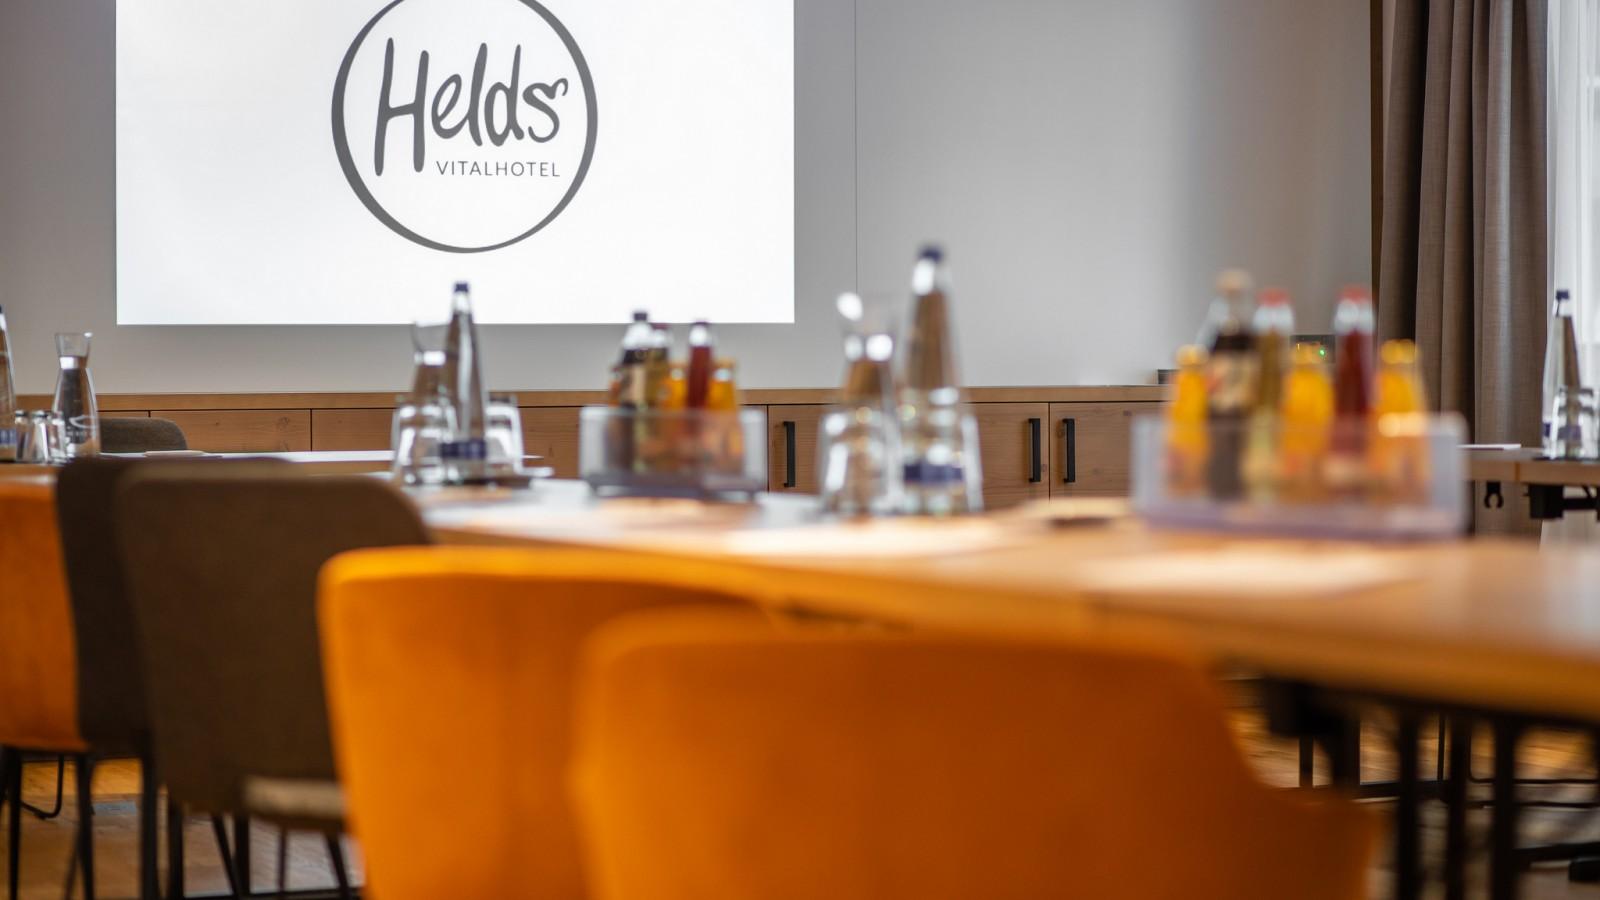 HELDs Vitalhotel | Conference Room Max&Moritz Logo